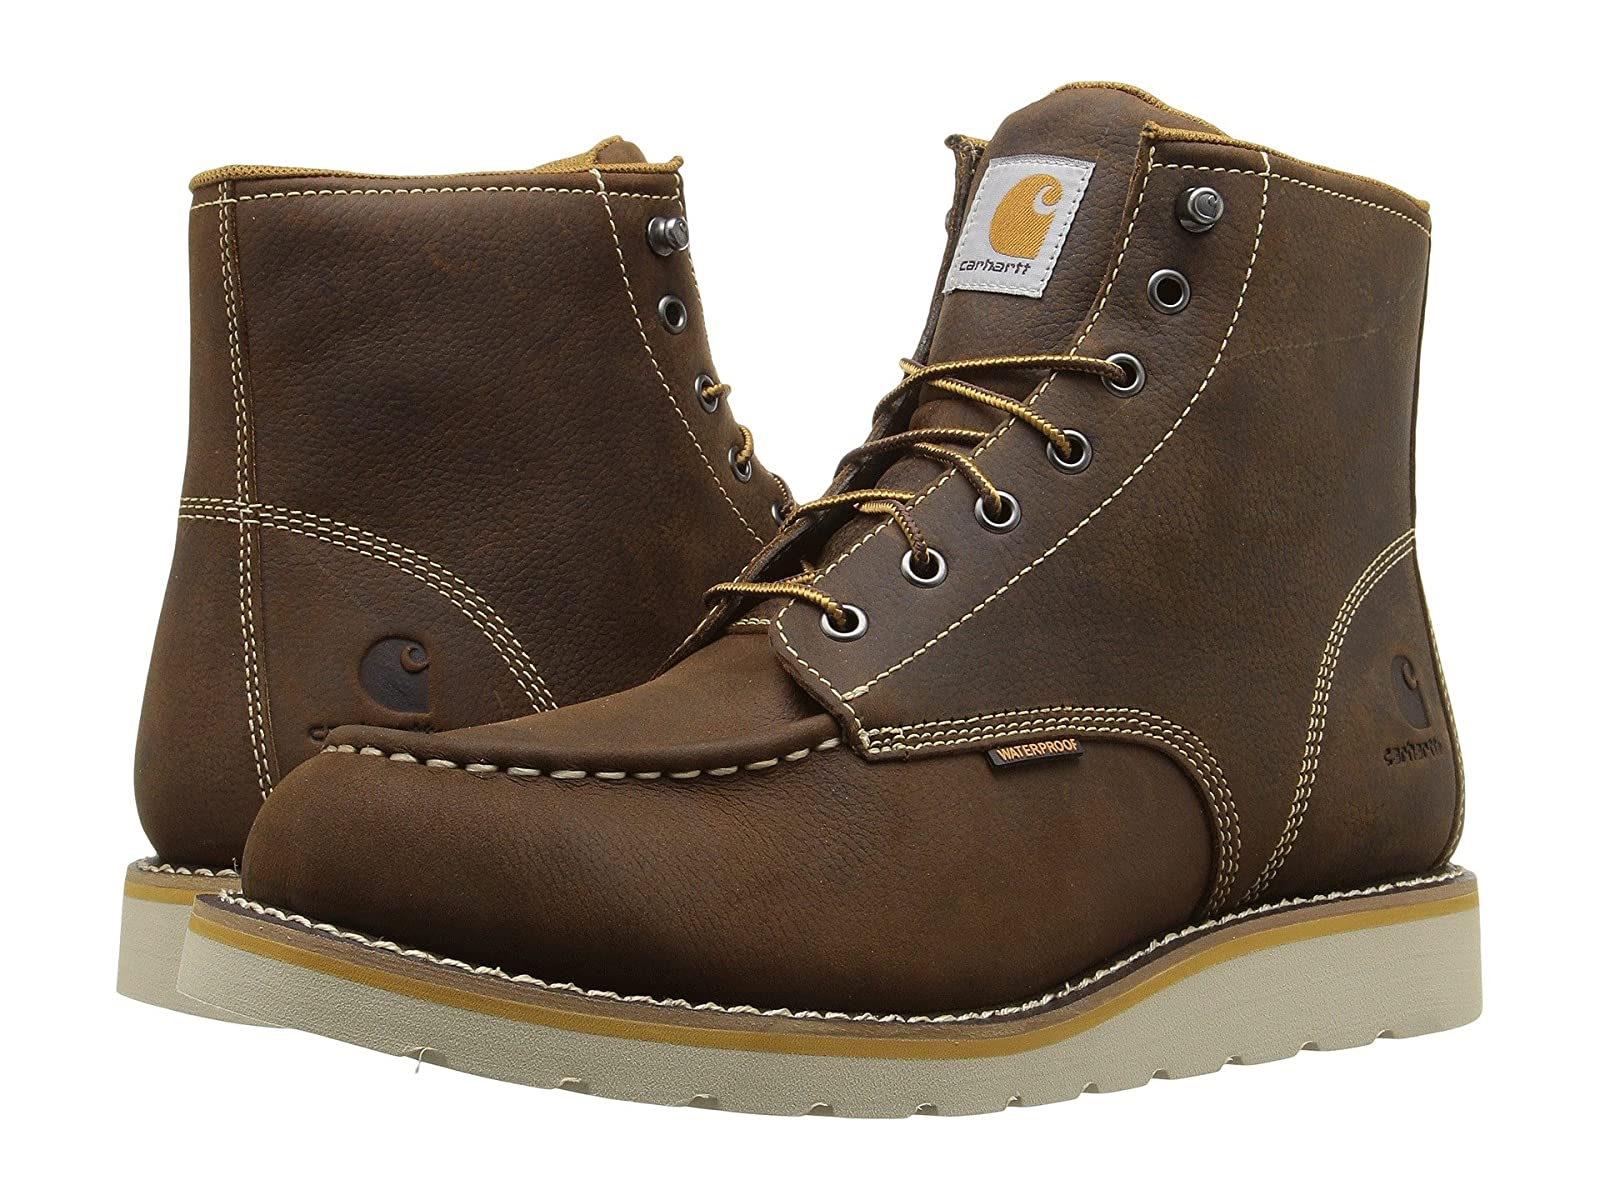 "Carhartt 6"" Waterproof Wedge Boot Boot Boot f59847"